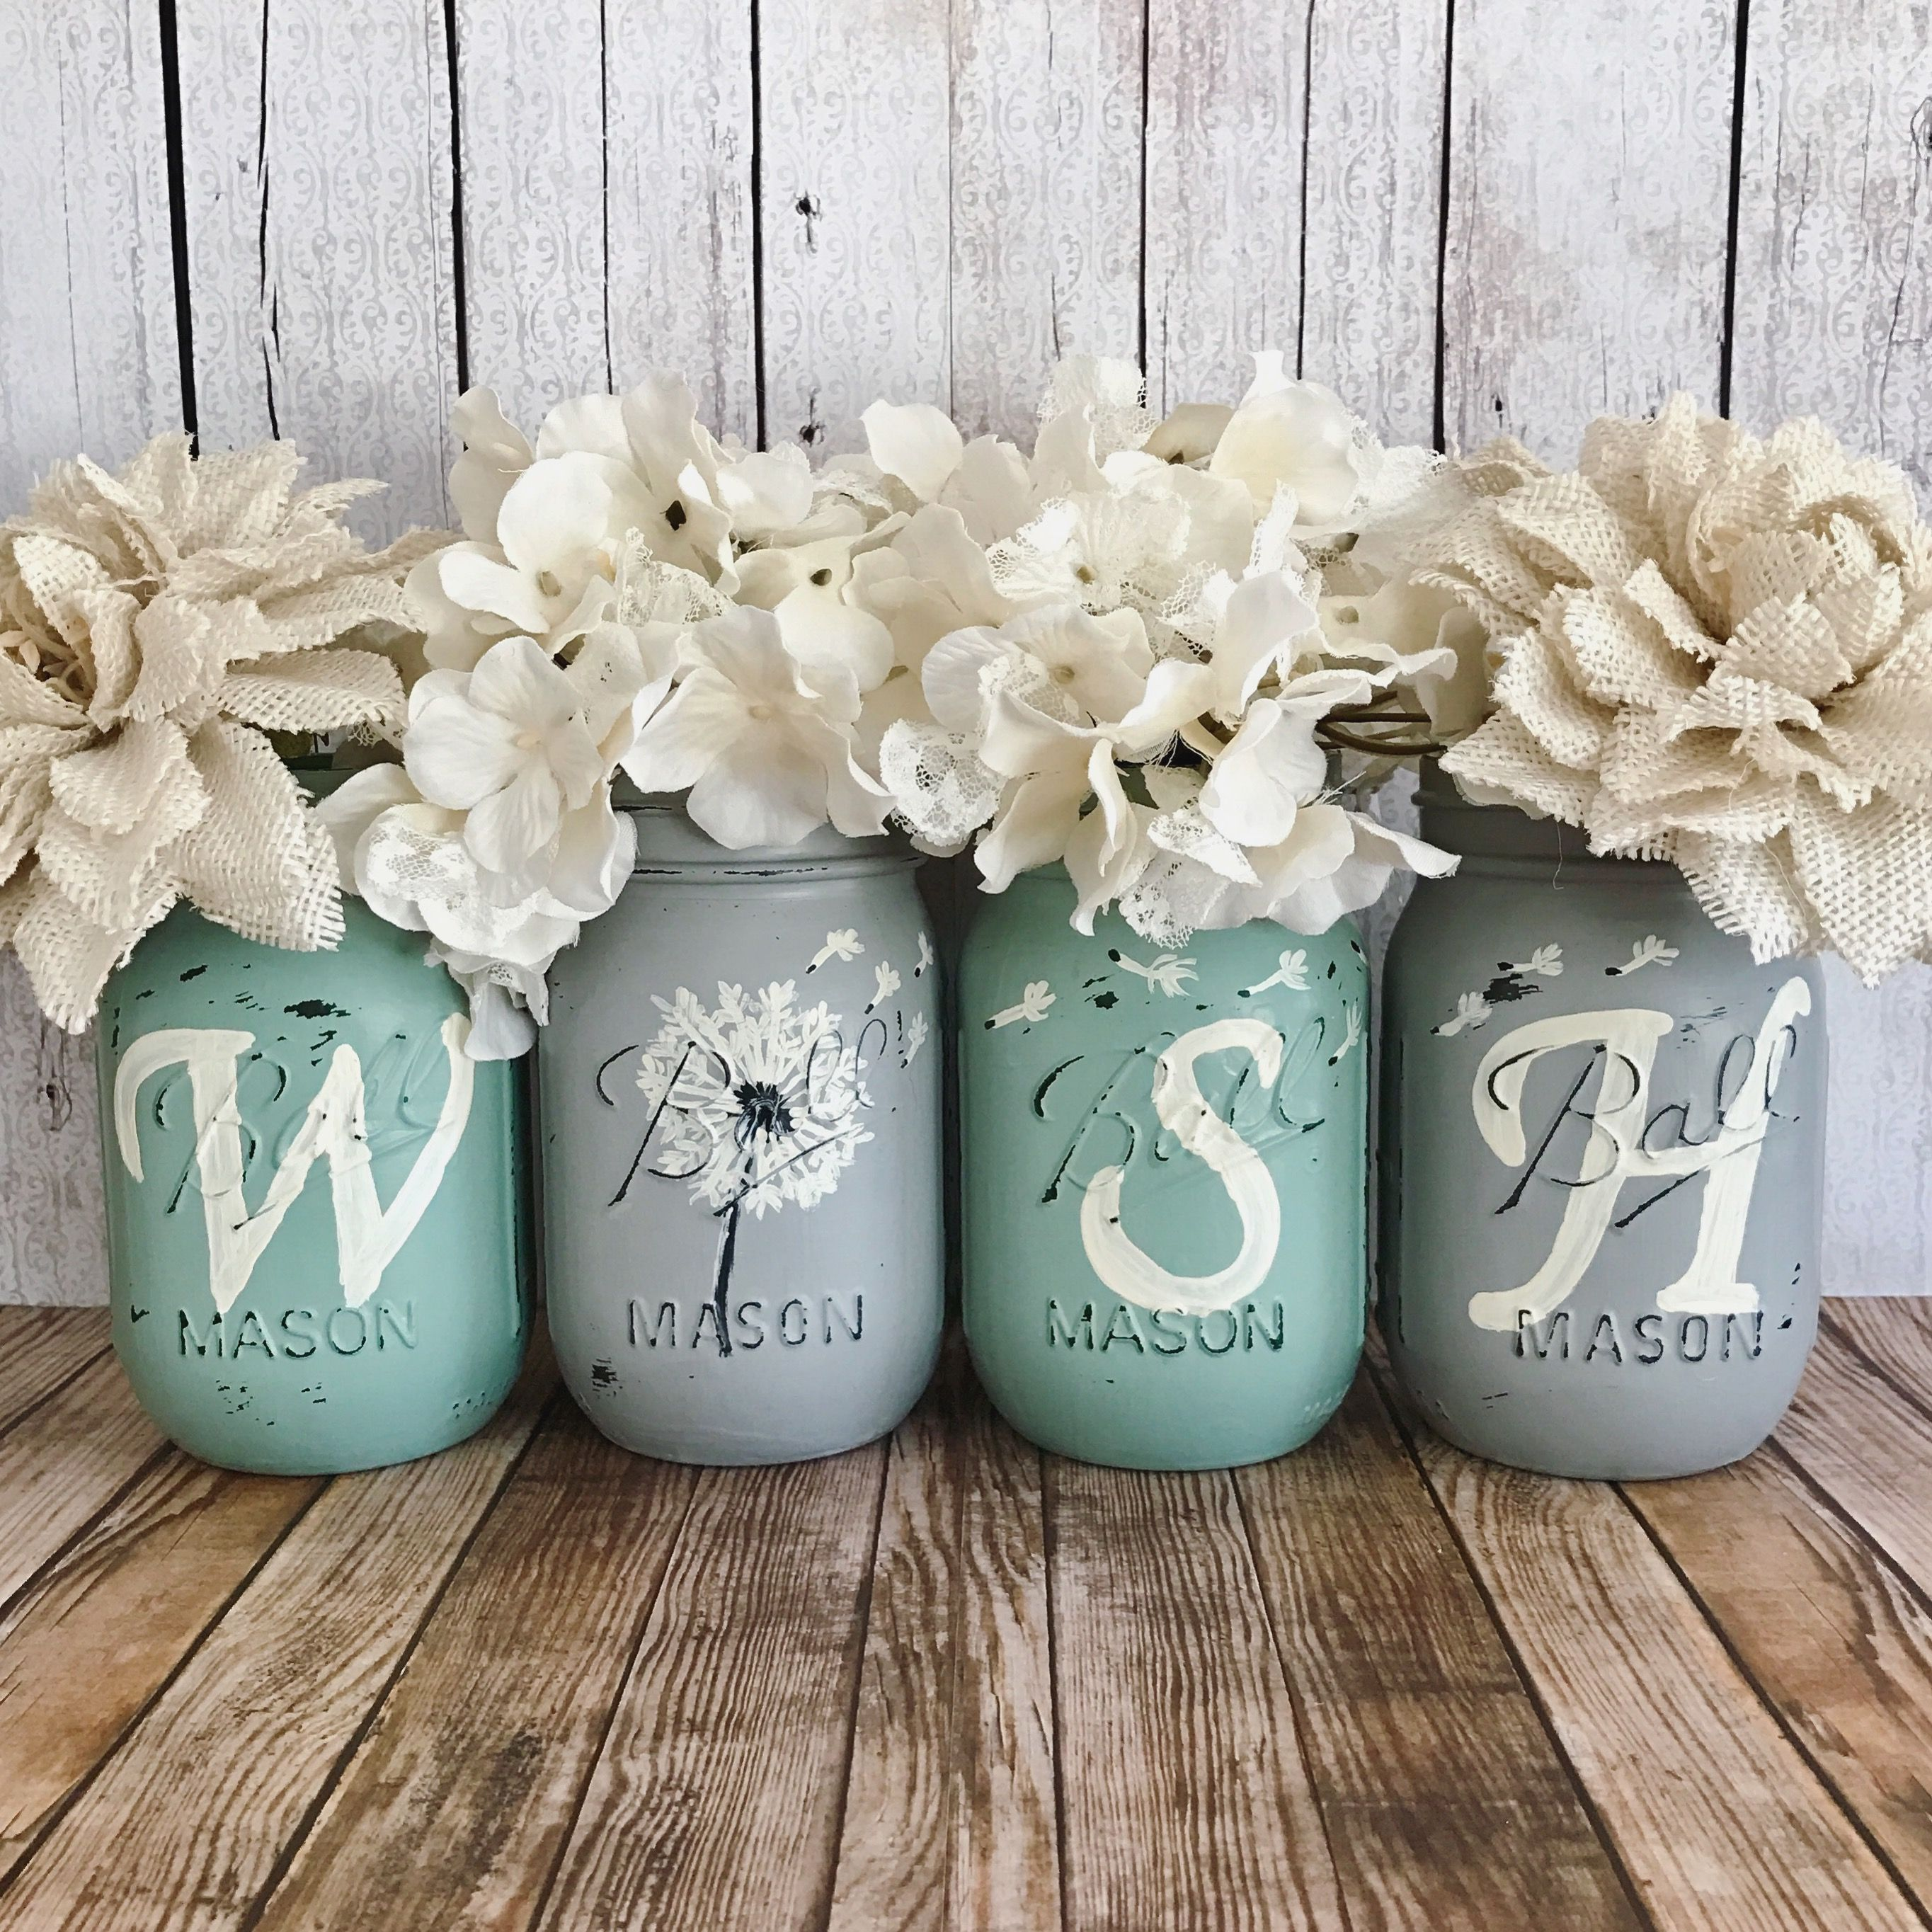 Dandelion WISH Mason jar set | rustic home decor | farmhouse decor | mint  and grey